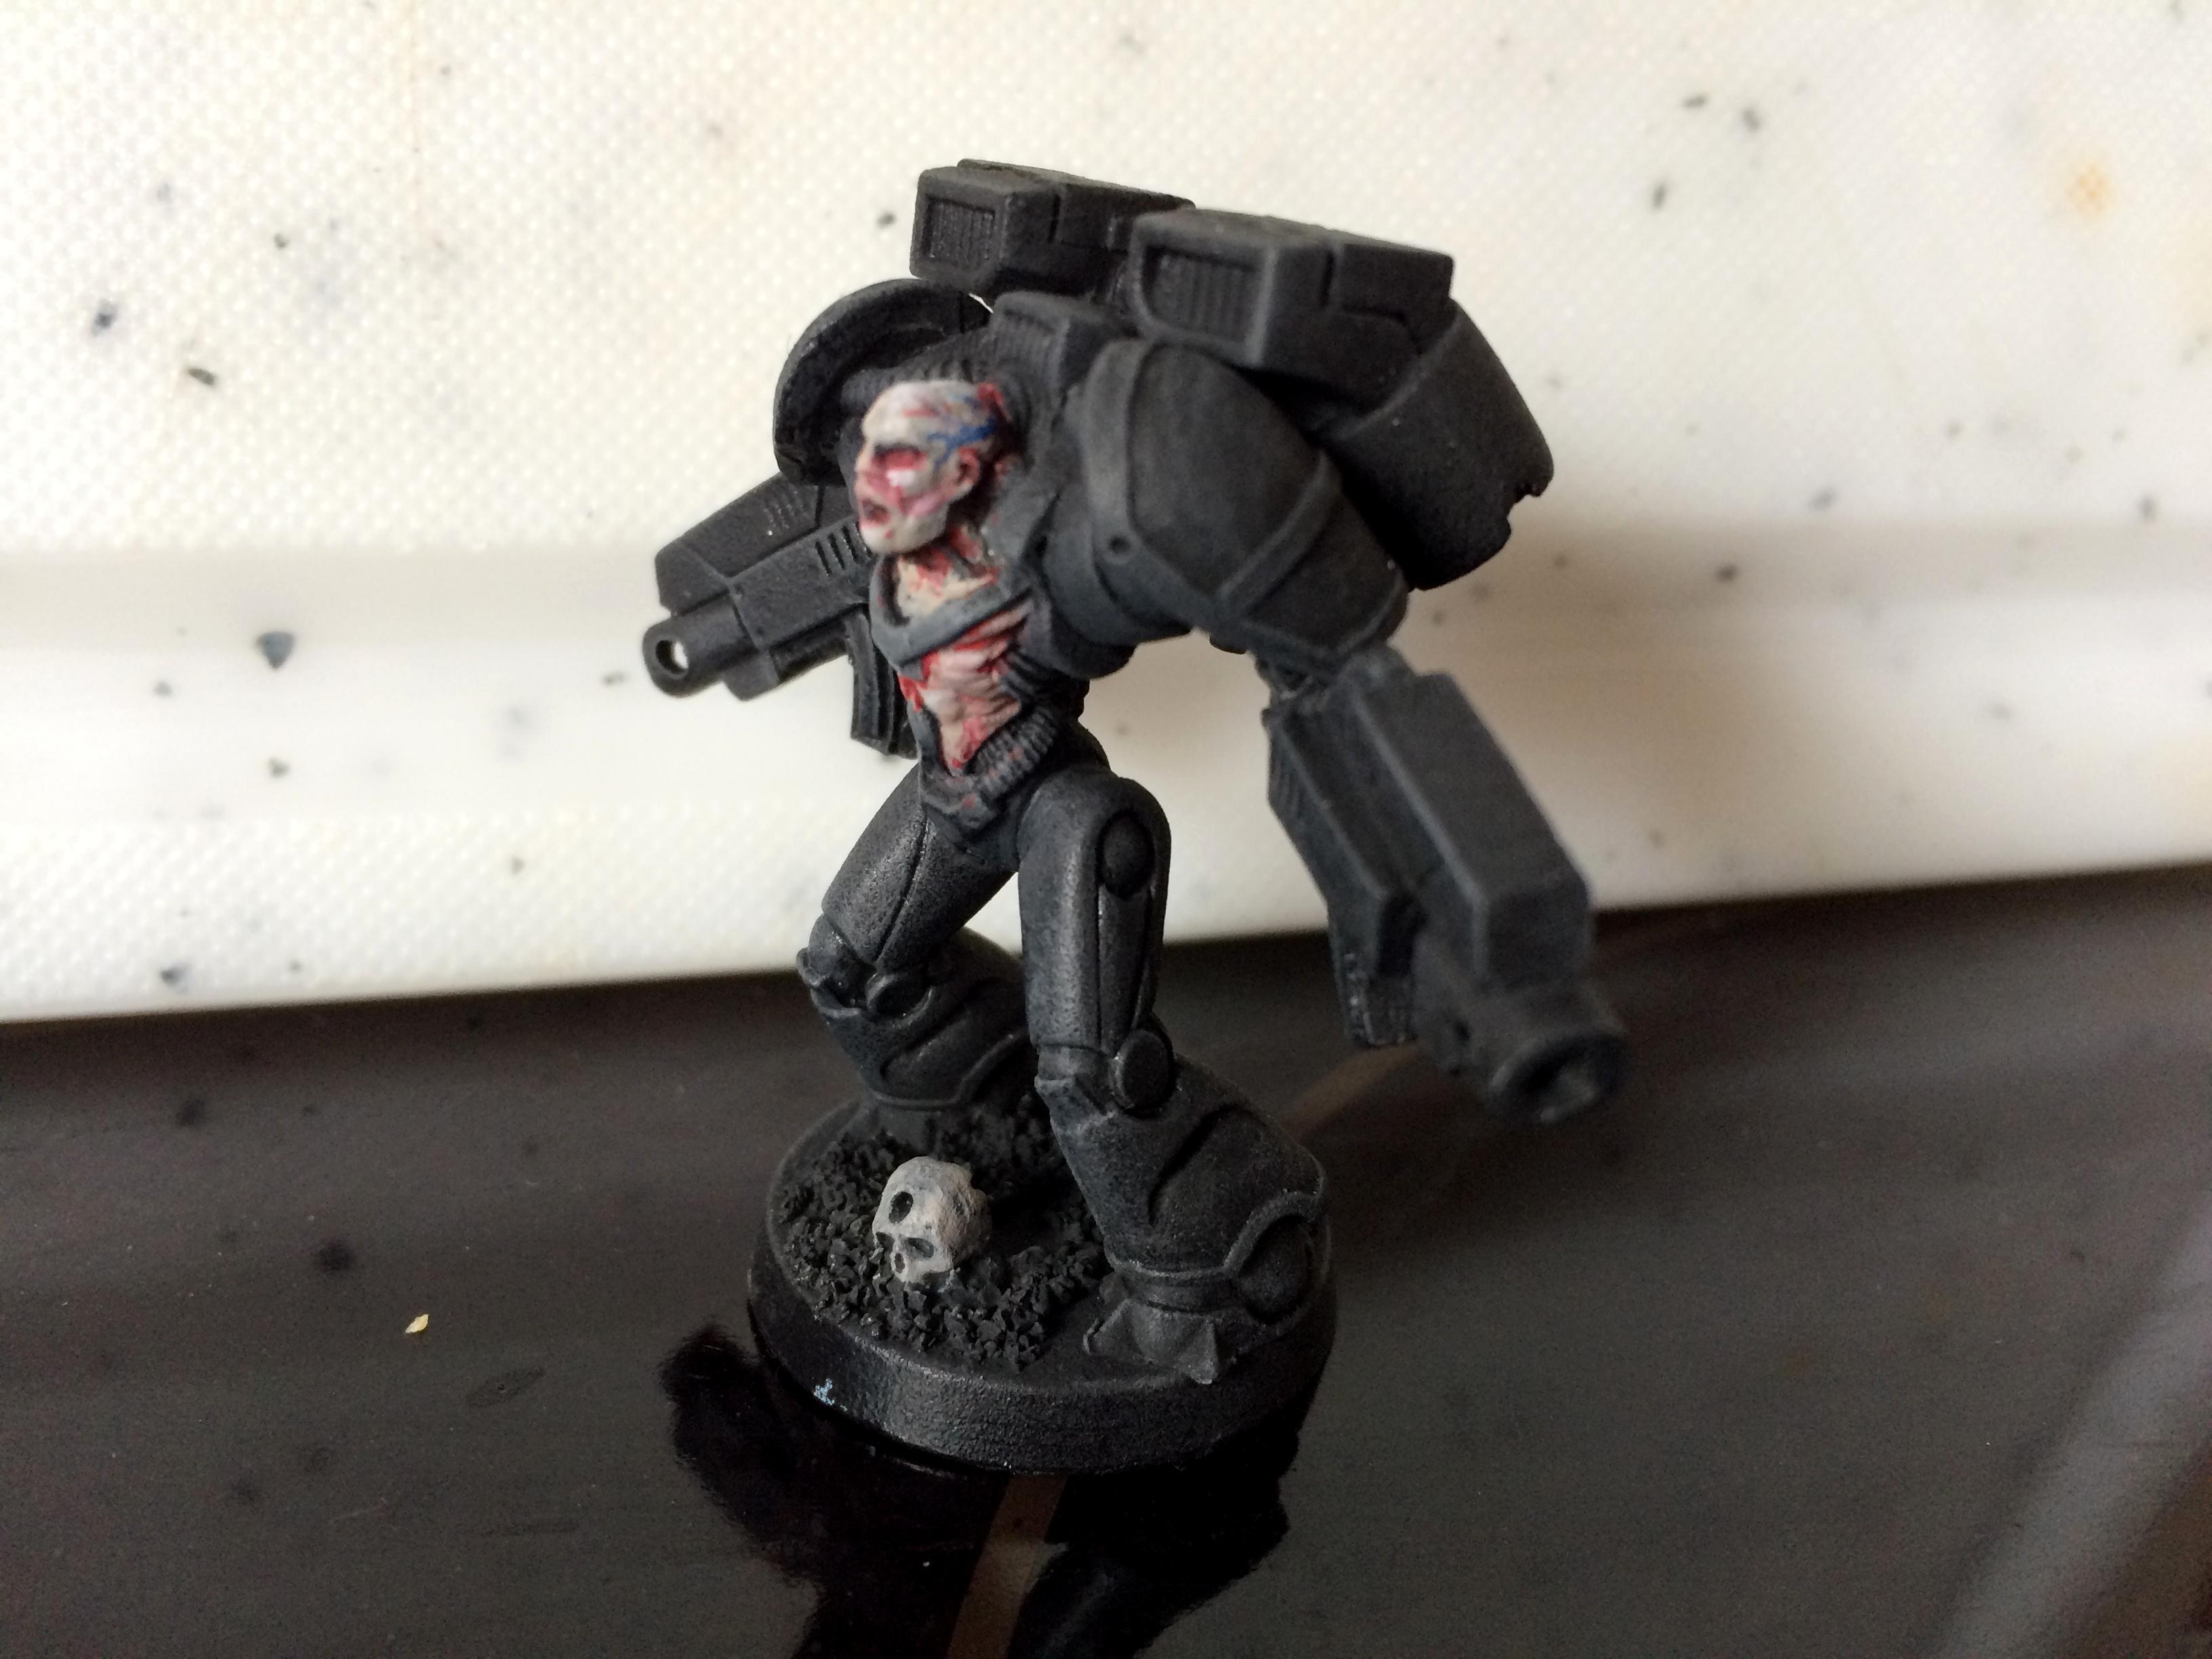 Bionics, Conversion, Dreadnought, Hands, Iron, Warmachine